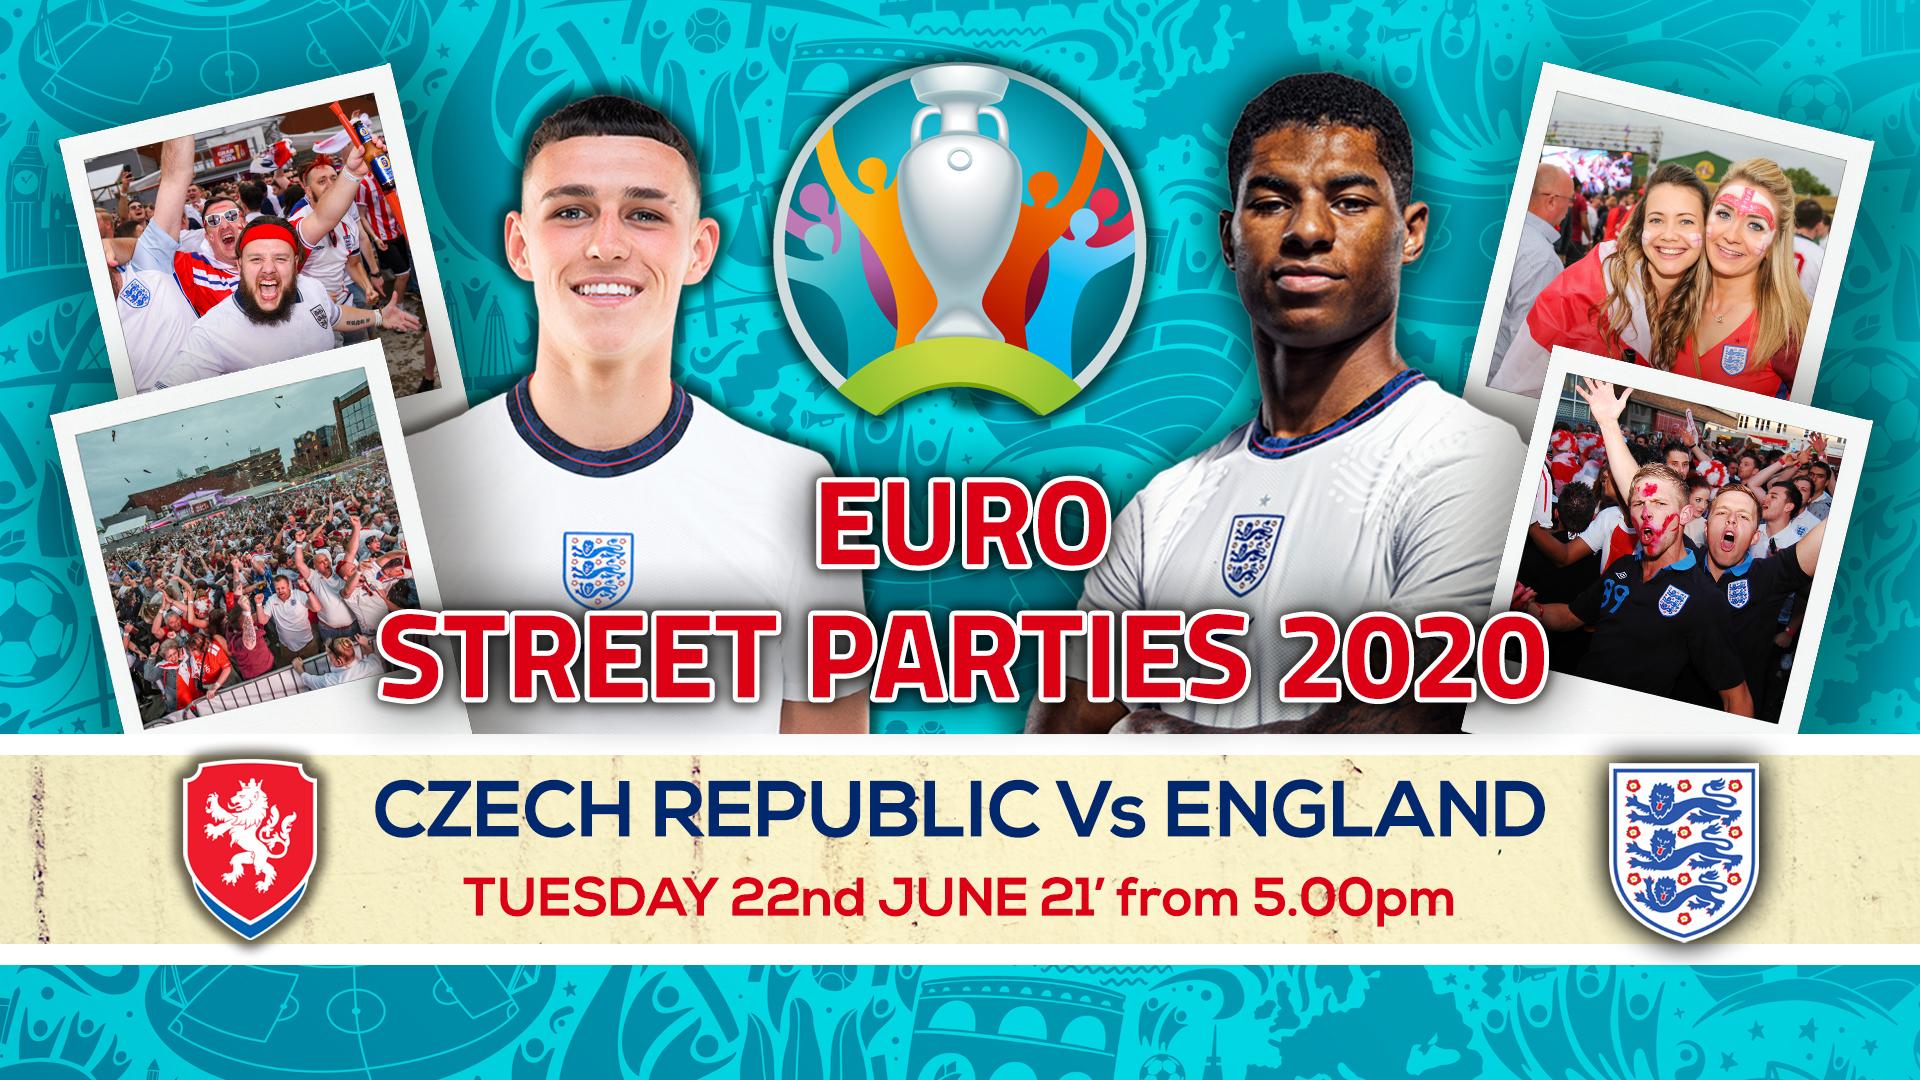 Czech Republic Vs England - Euro 2020 Street Party